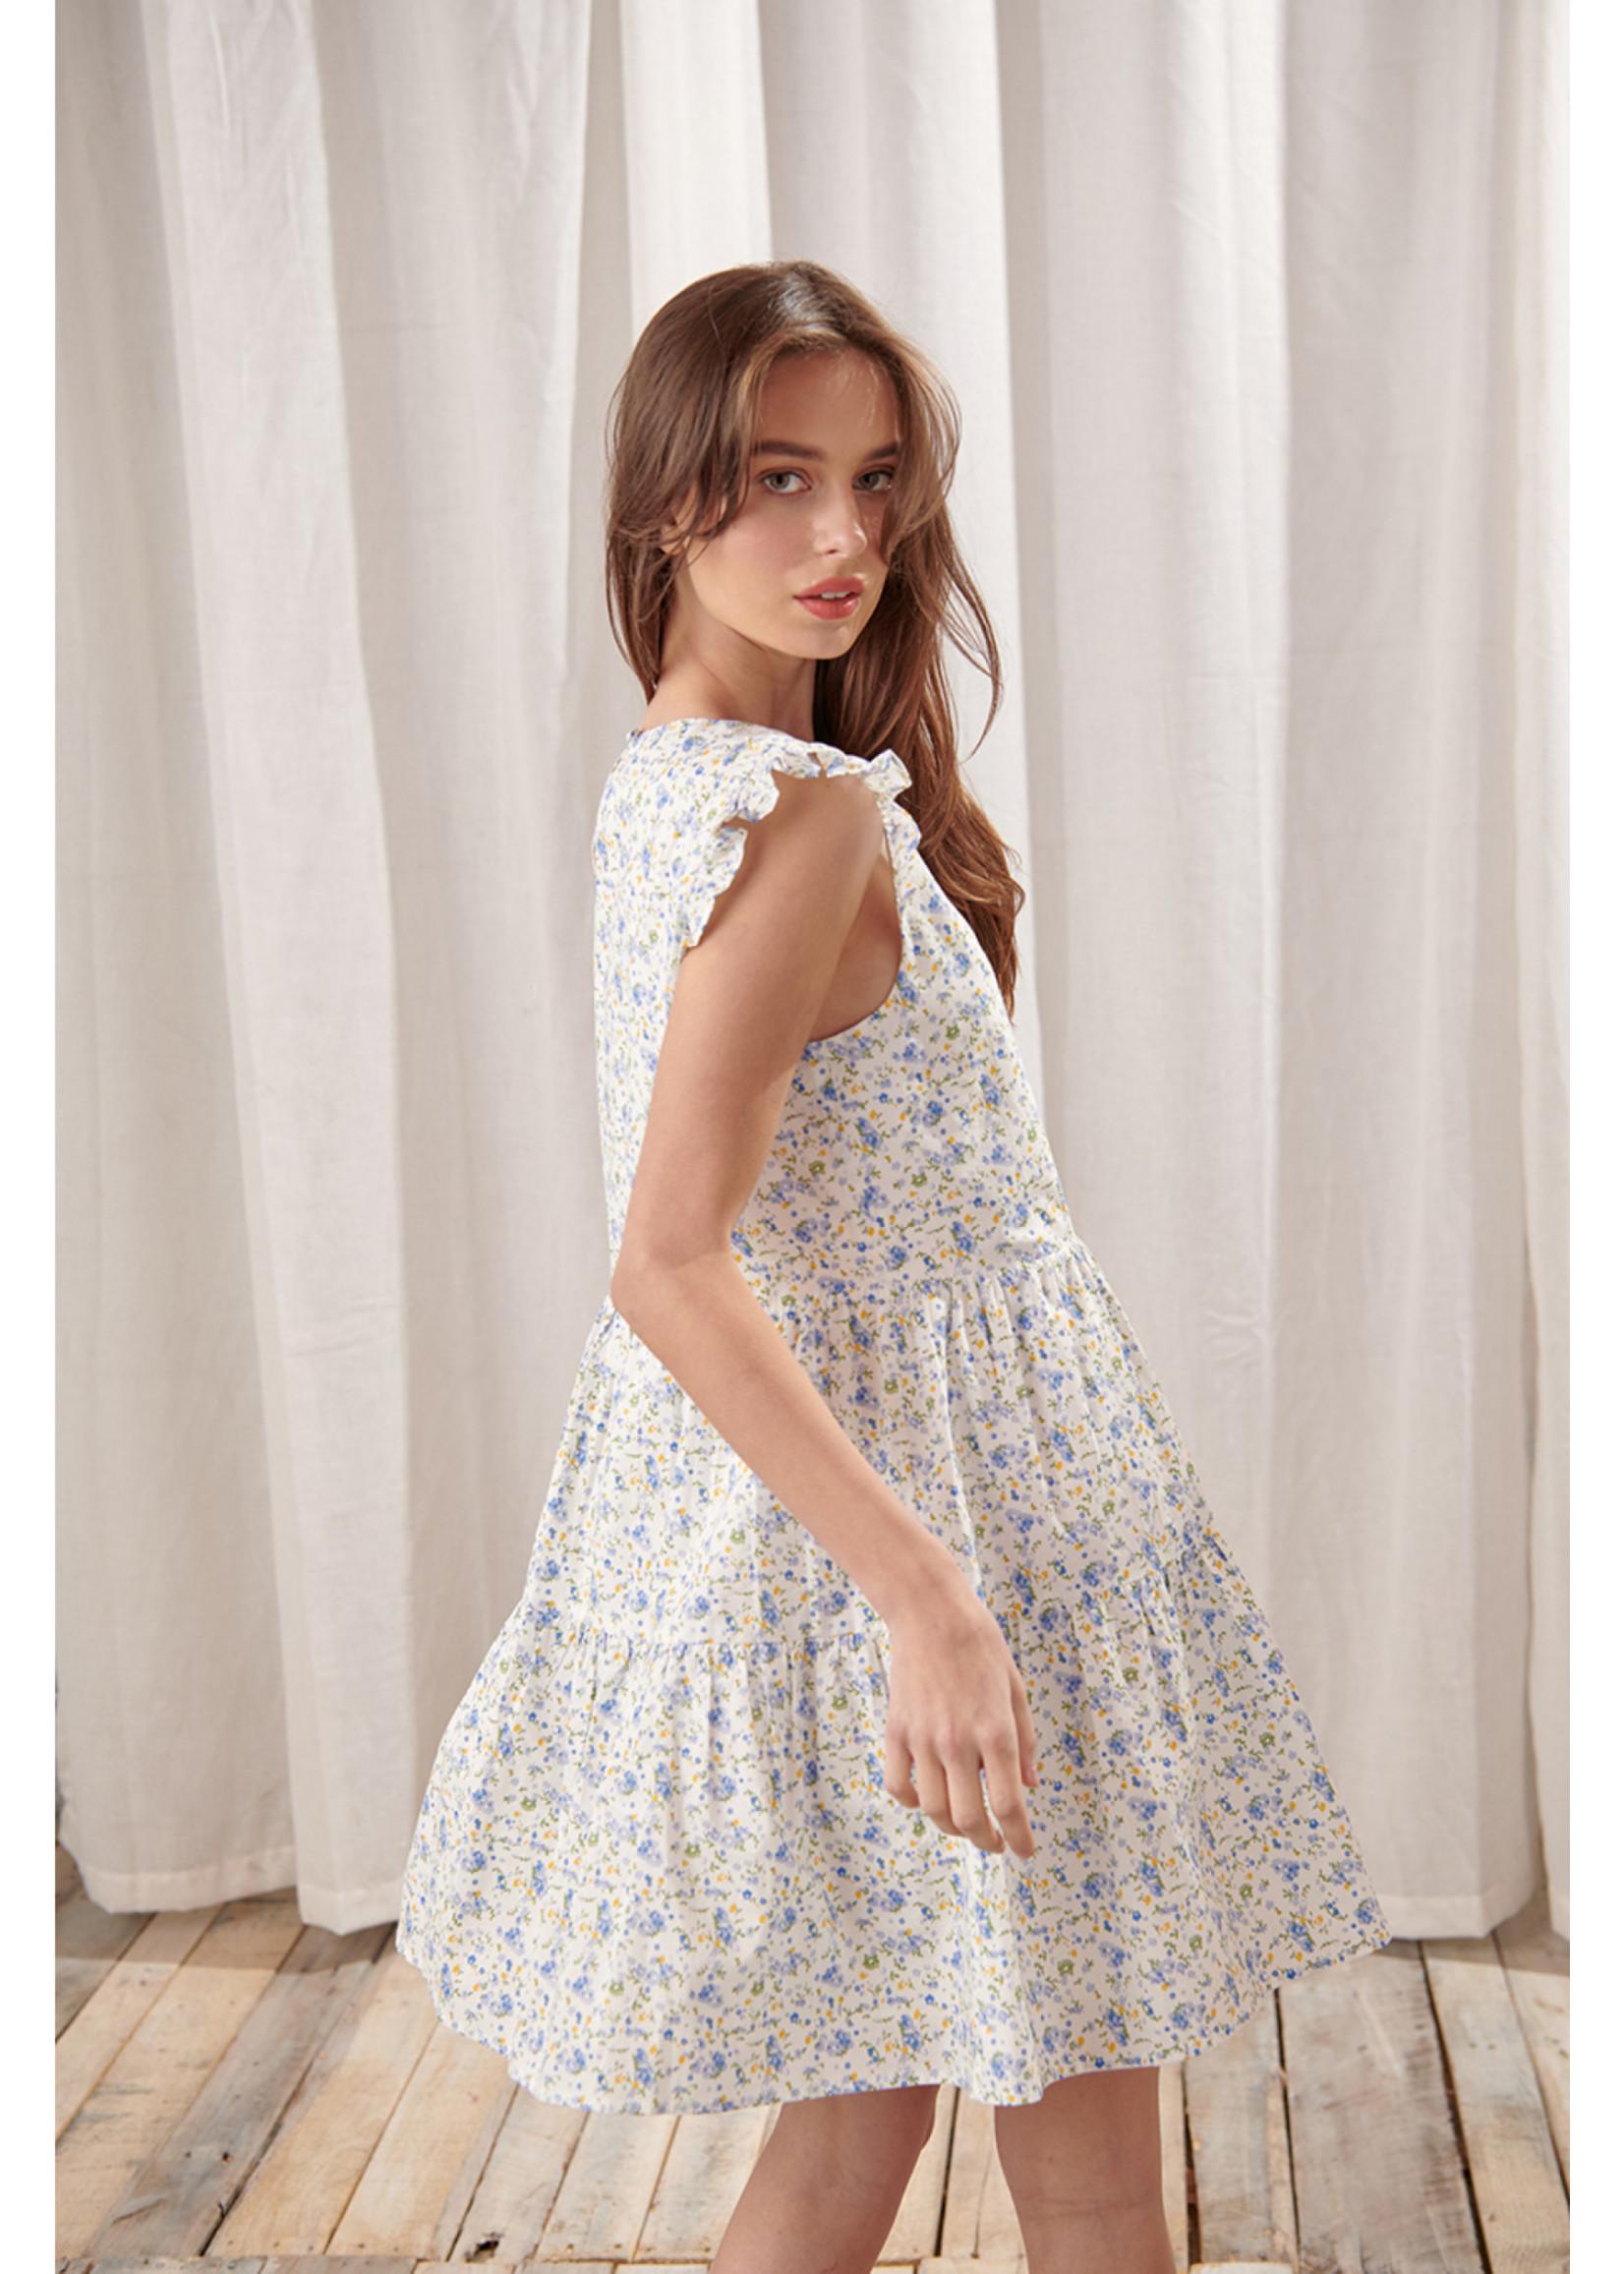 Storia Floral Capped Sleeve Mini Dress - BD2160